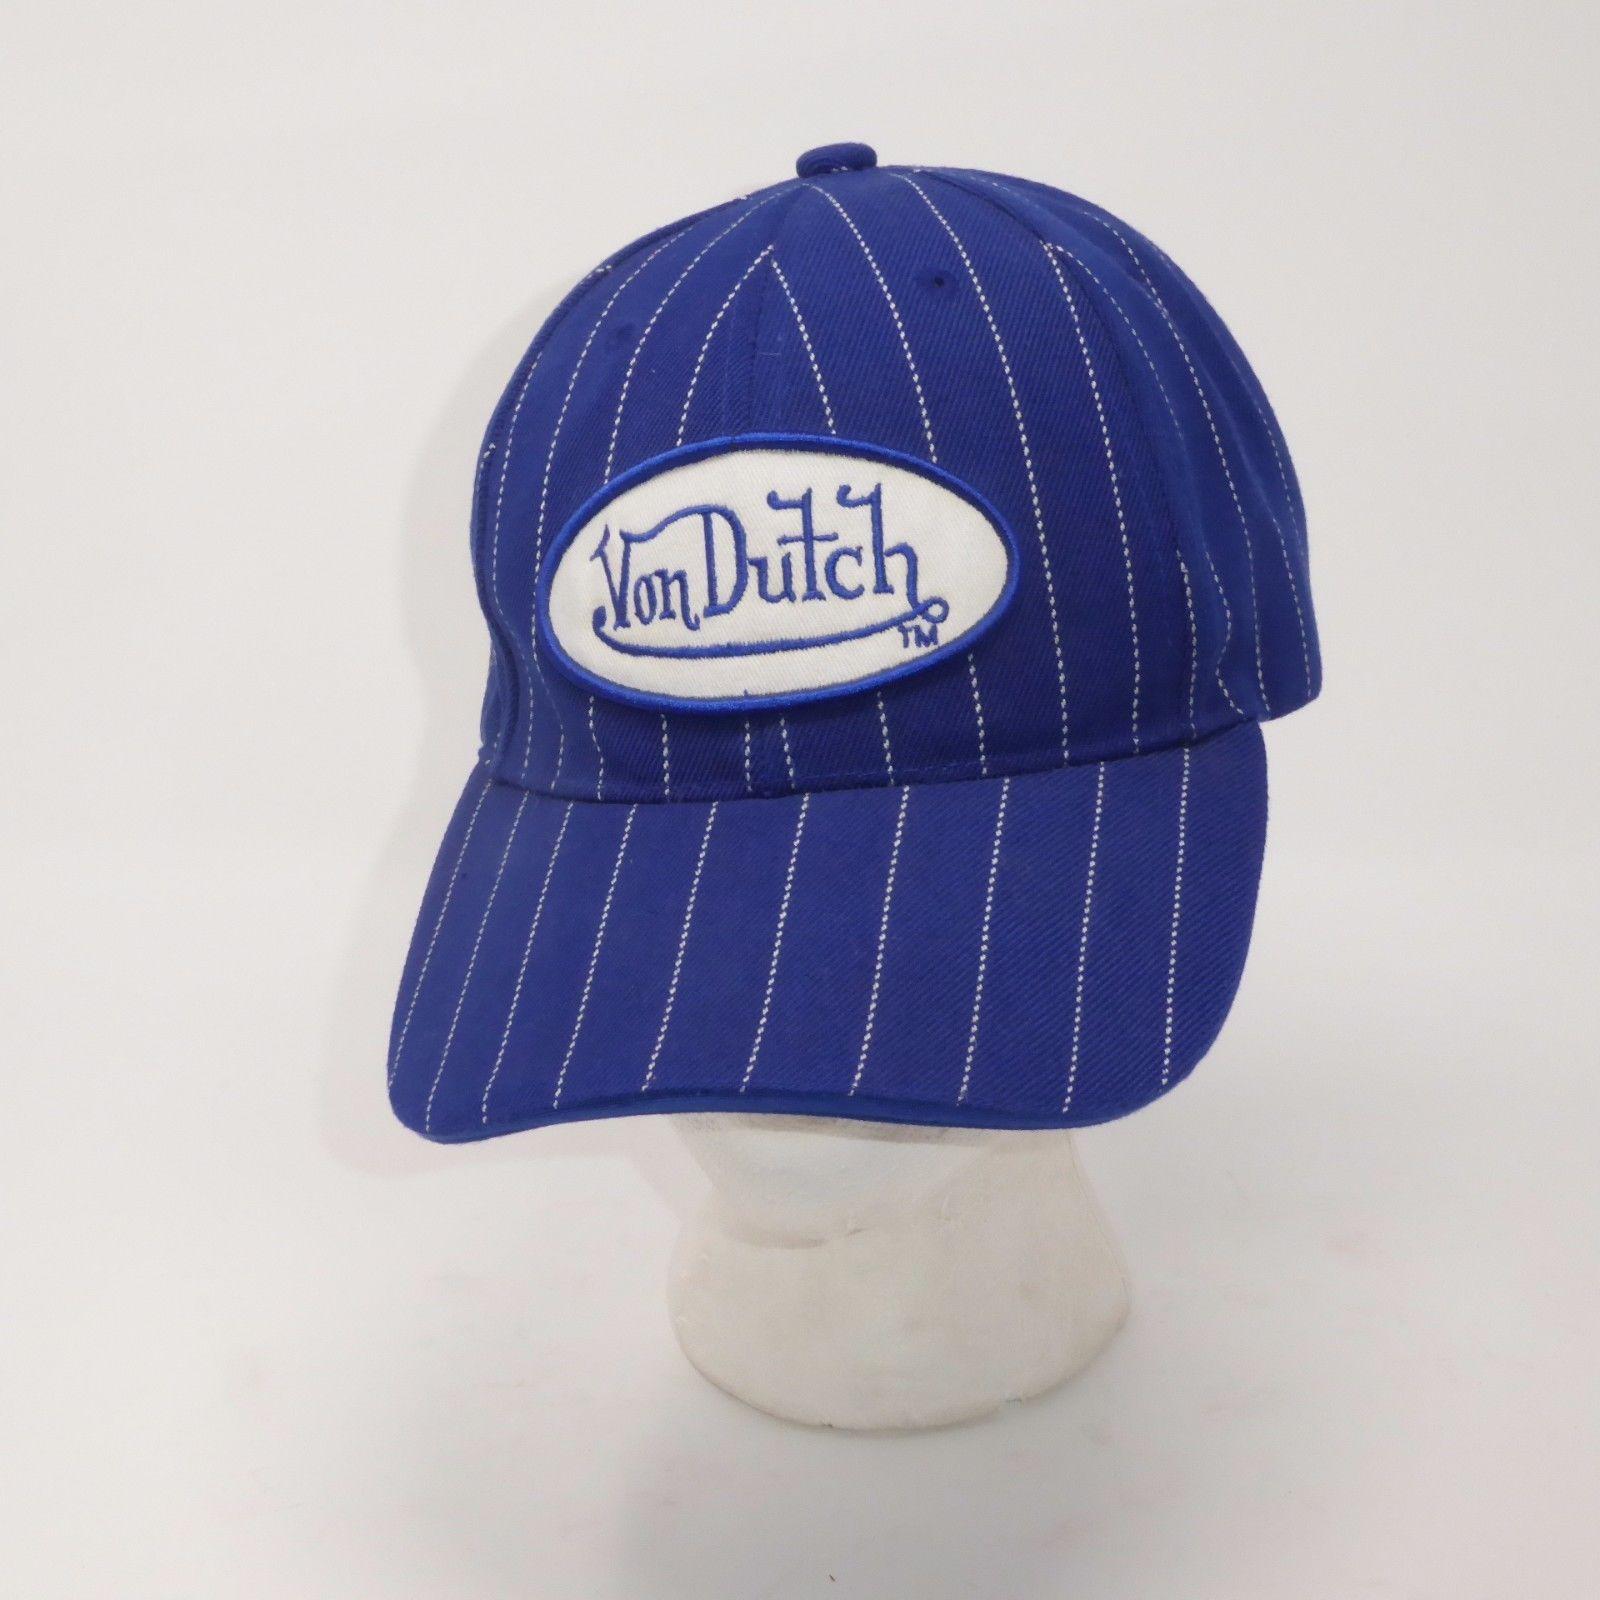 9681432946309b Von Dutch Baseball Hat Cap Blue and 50 similar items